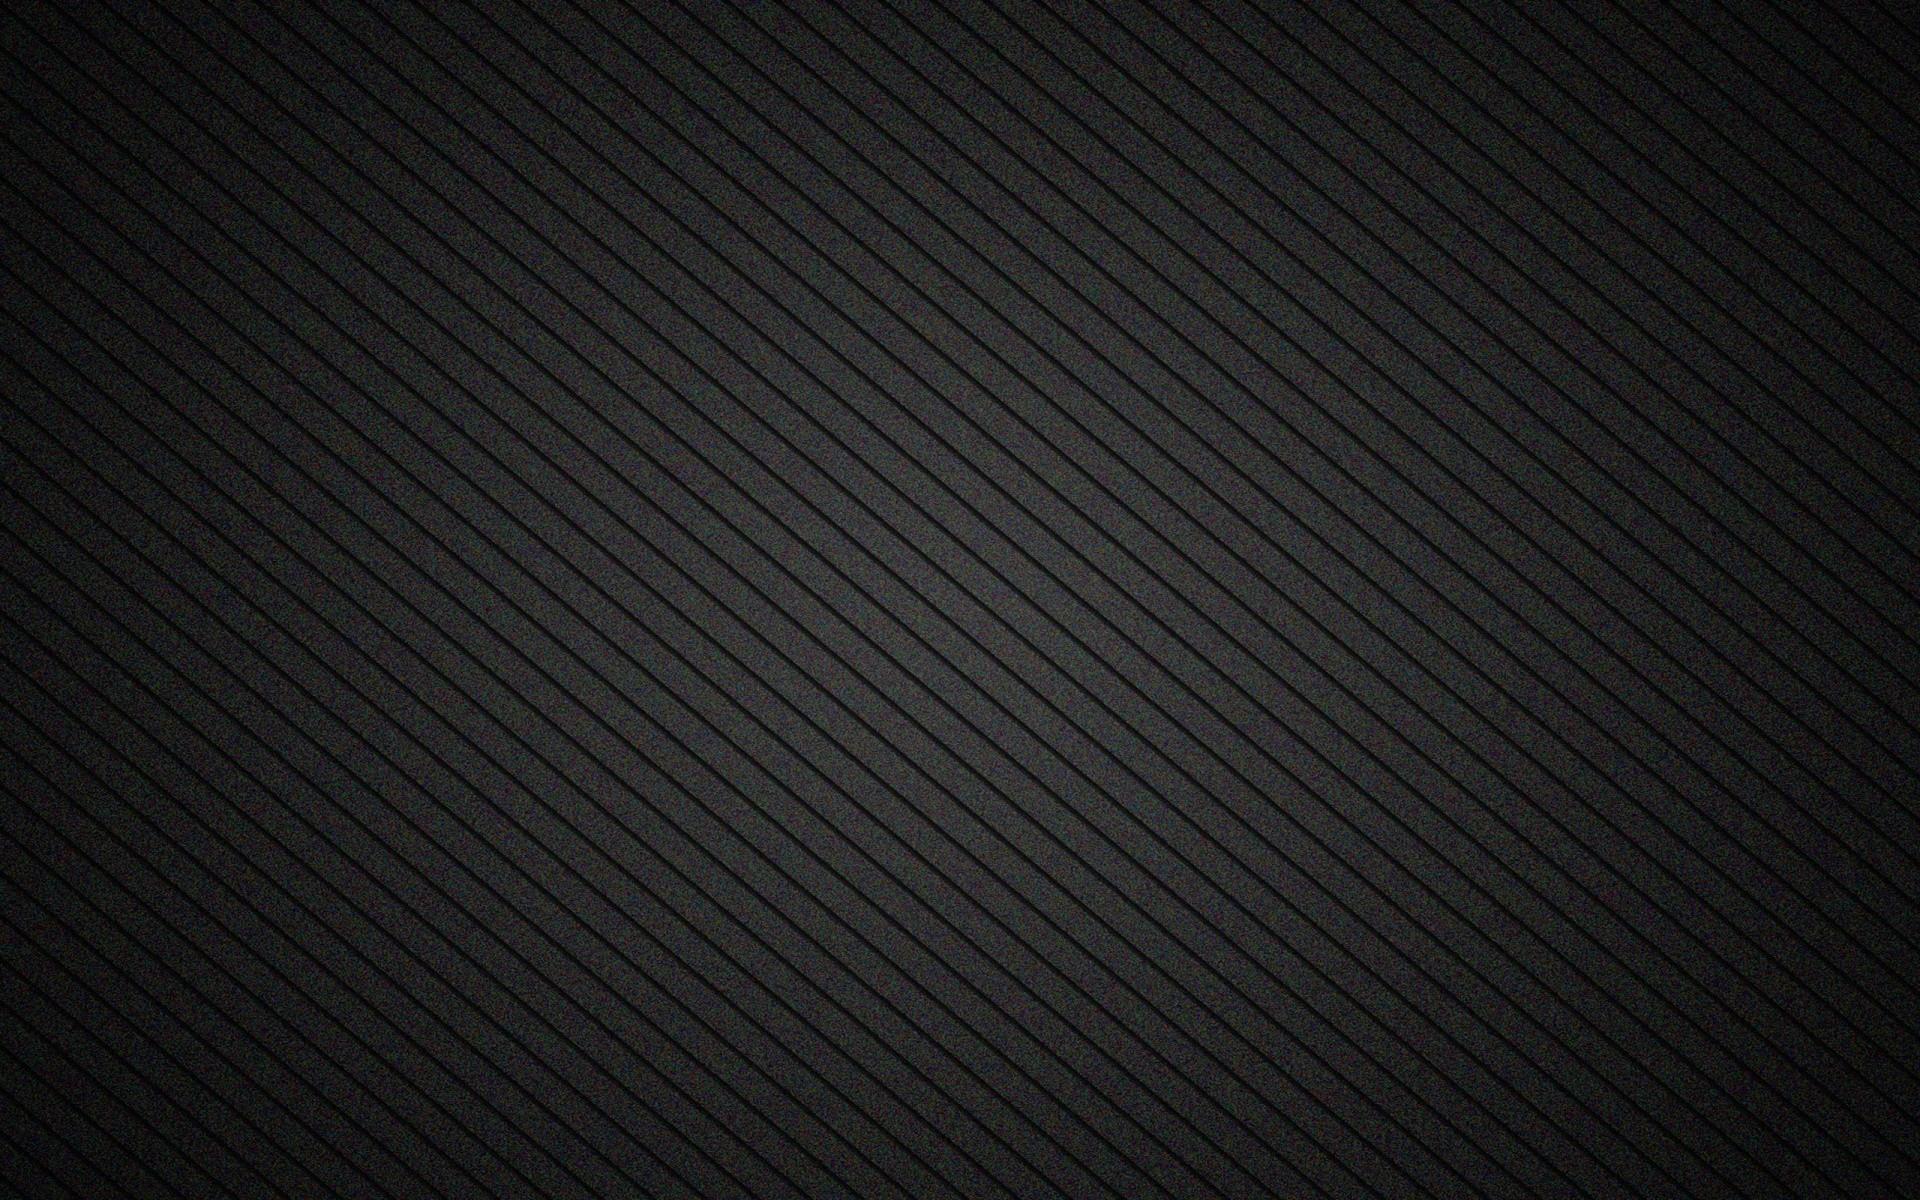 black background 1920x1200 - photo #12